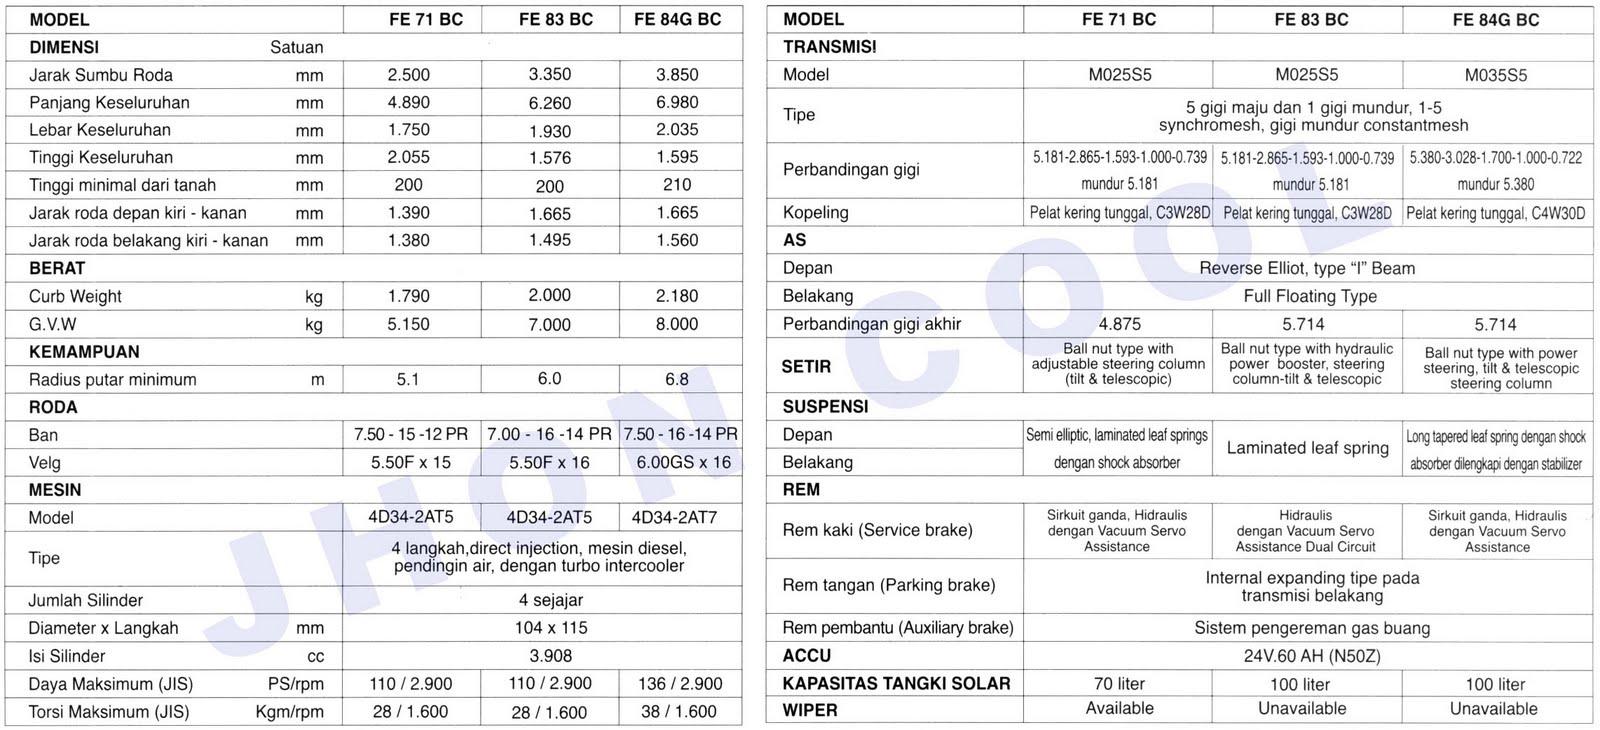 Bursa Truck Fe 83 Bc 6 Tire